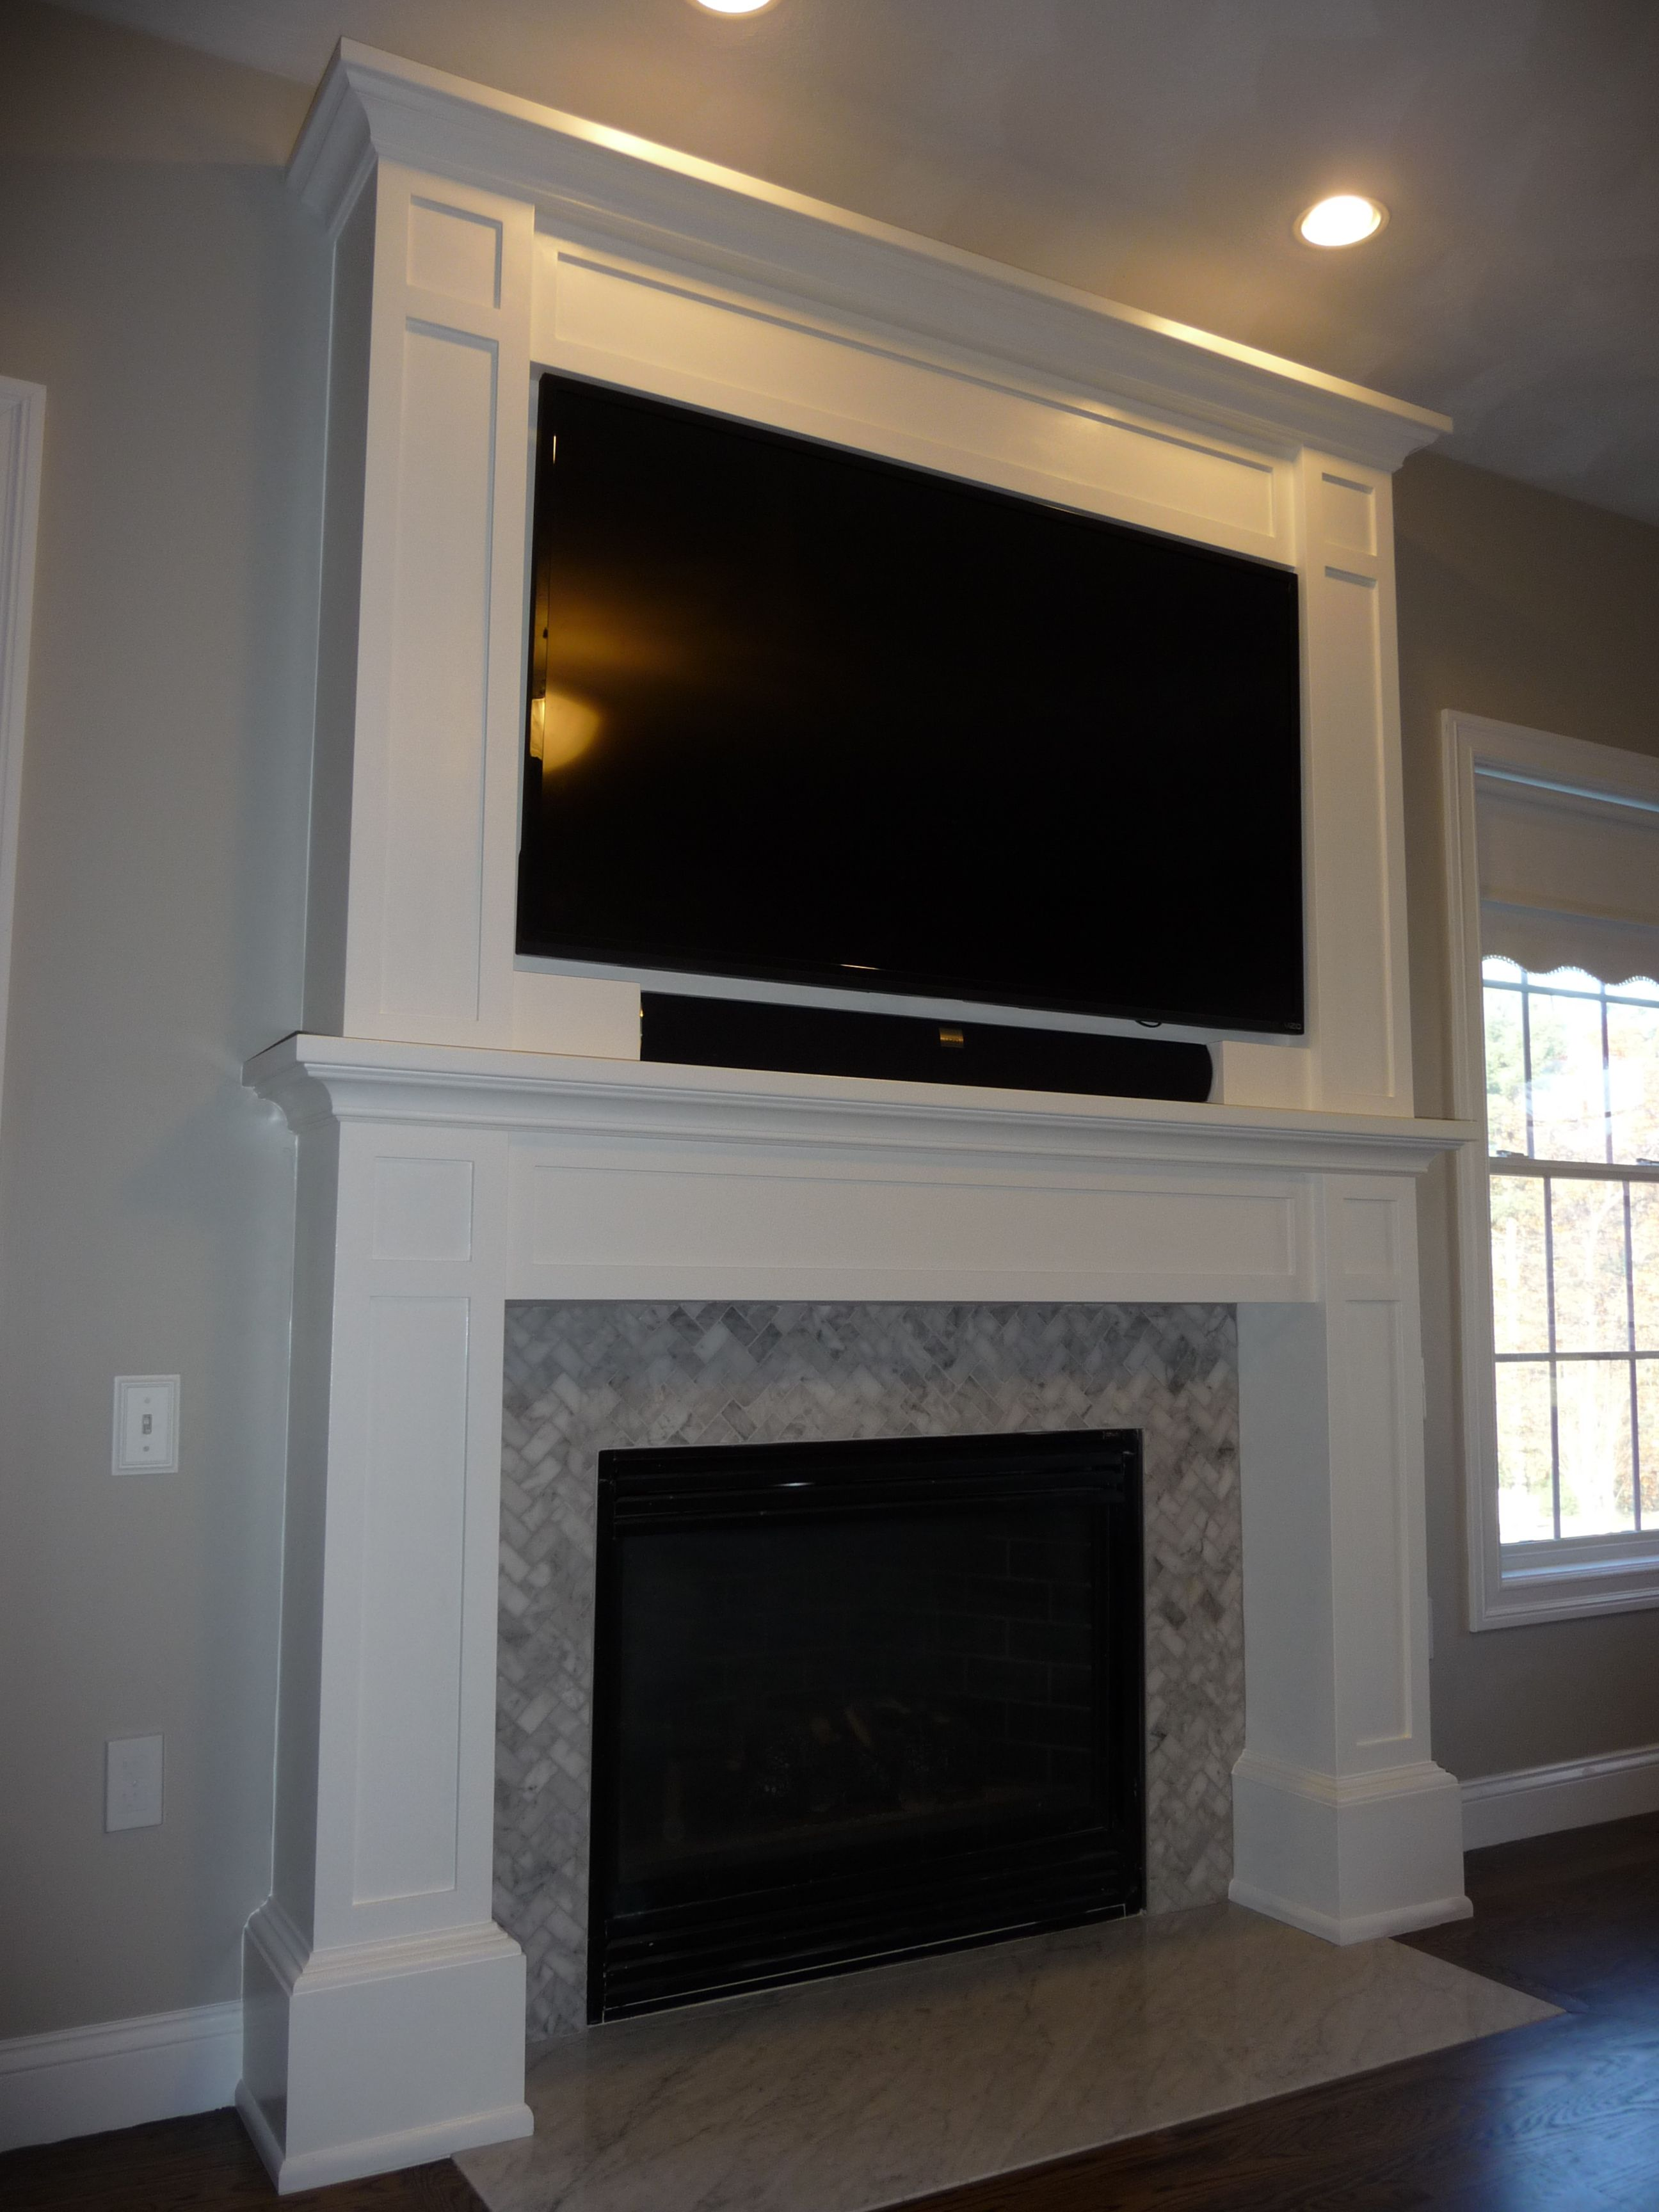 Custom Mantle Tv Cabinet W Herring Bone Carrera Tile